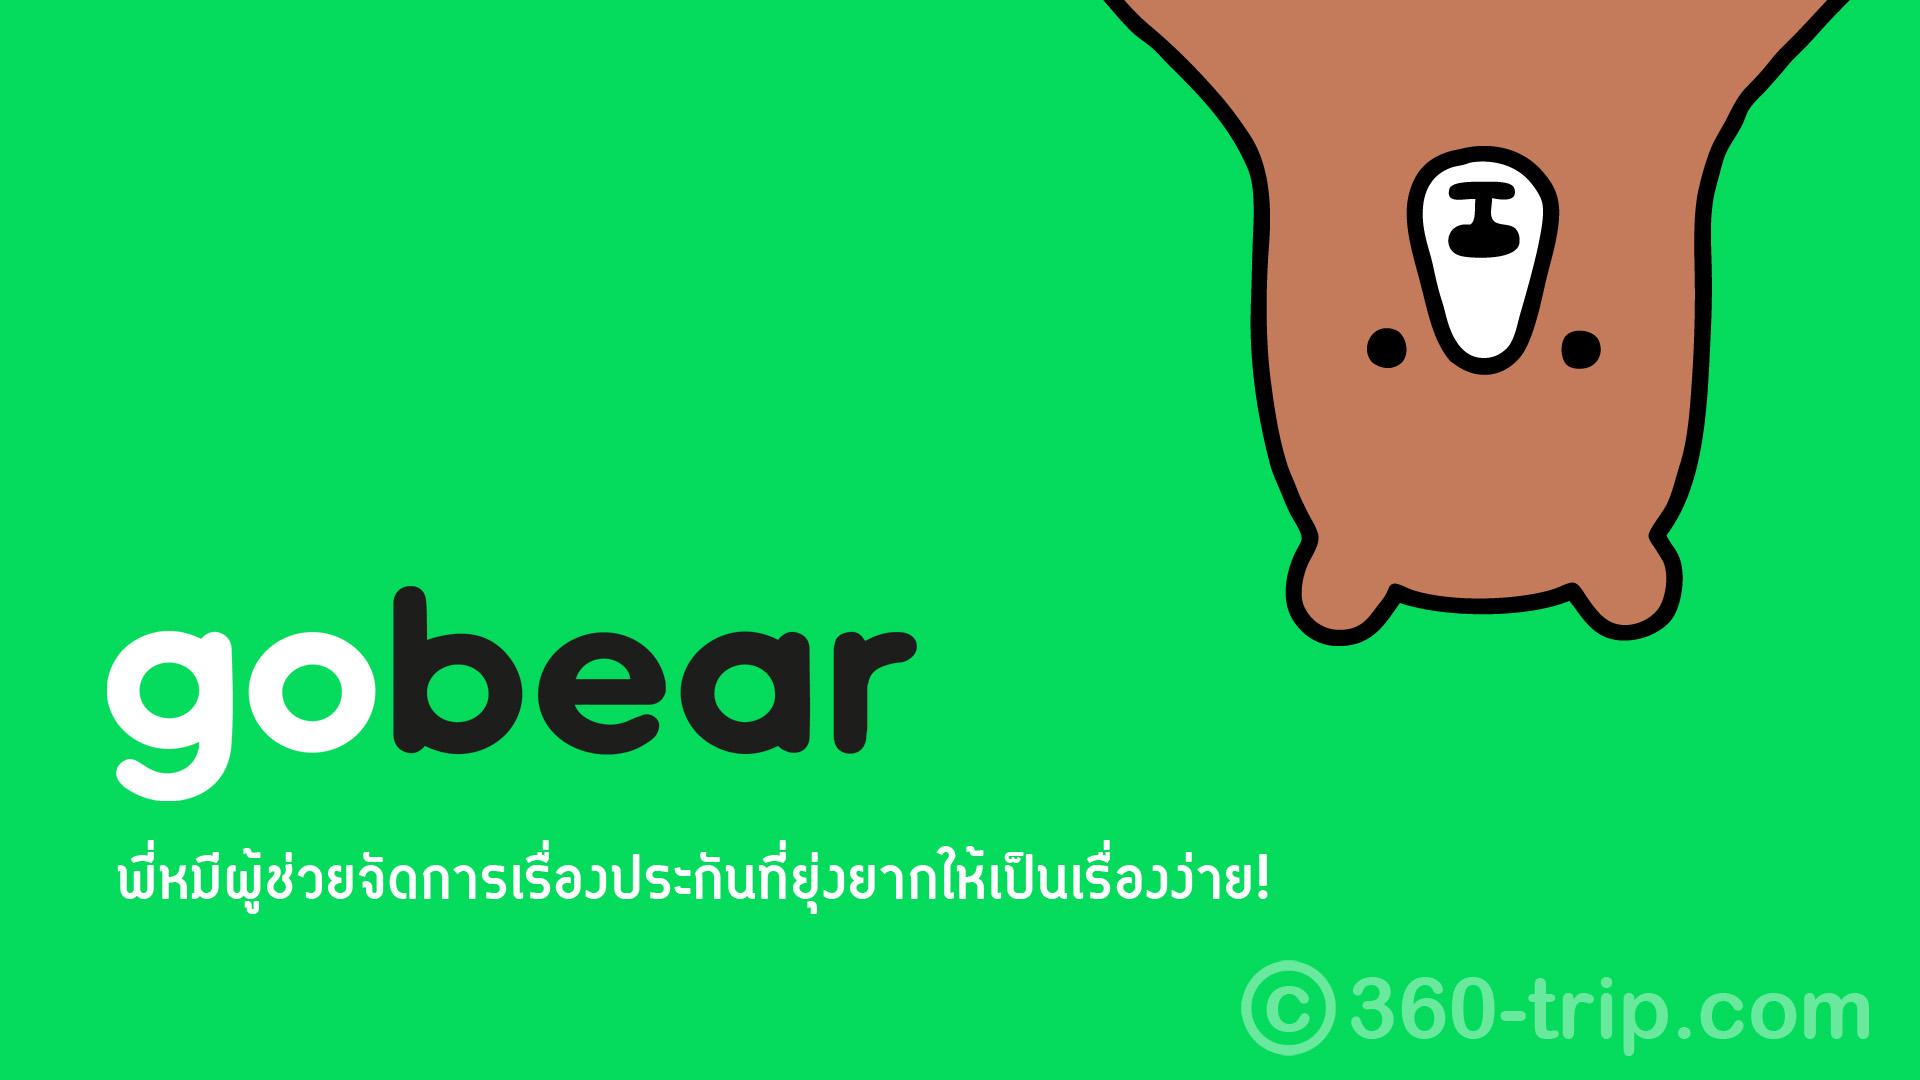 gobear-financial-meta-search-โกแบร์-ประกันรถ-ประกันเดินทาง